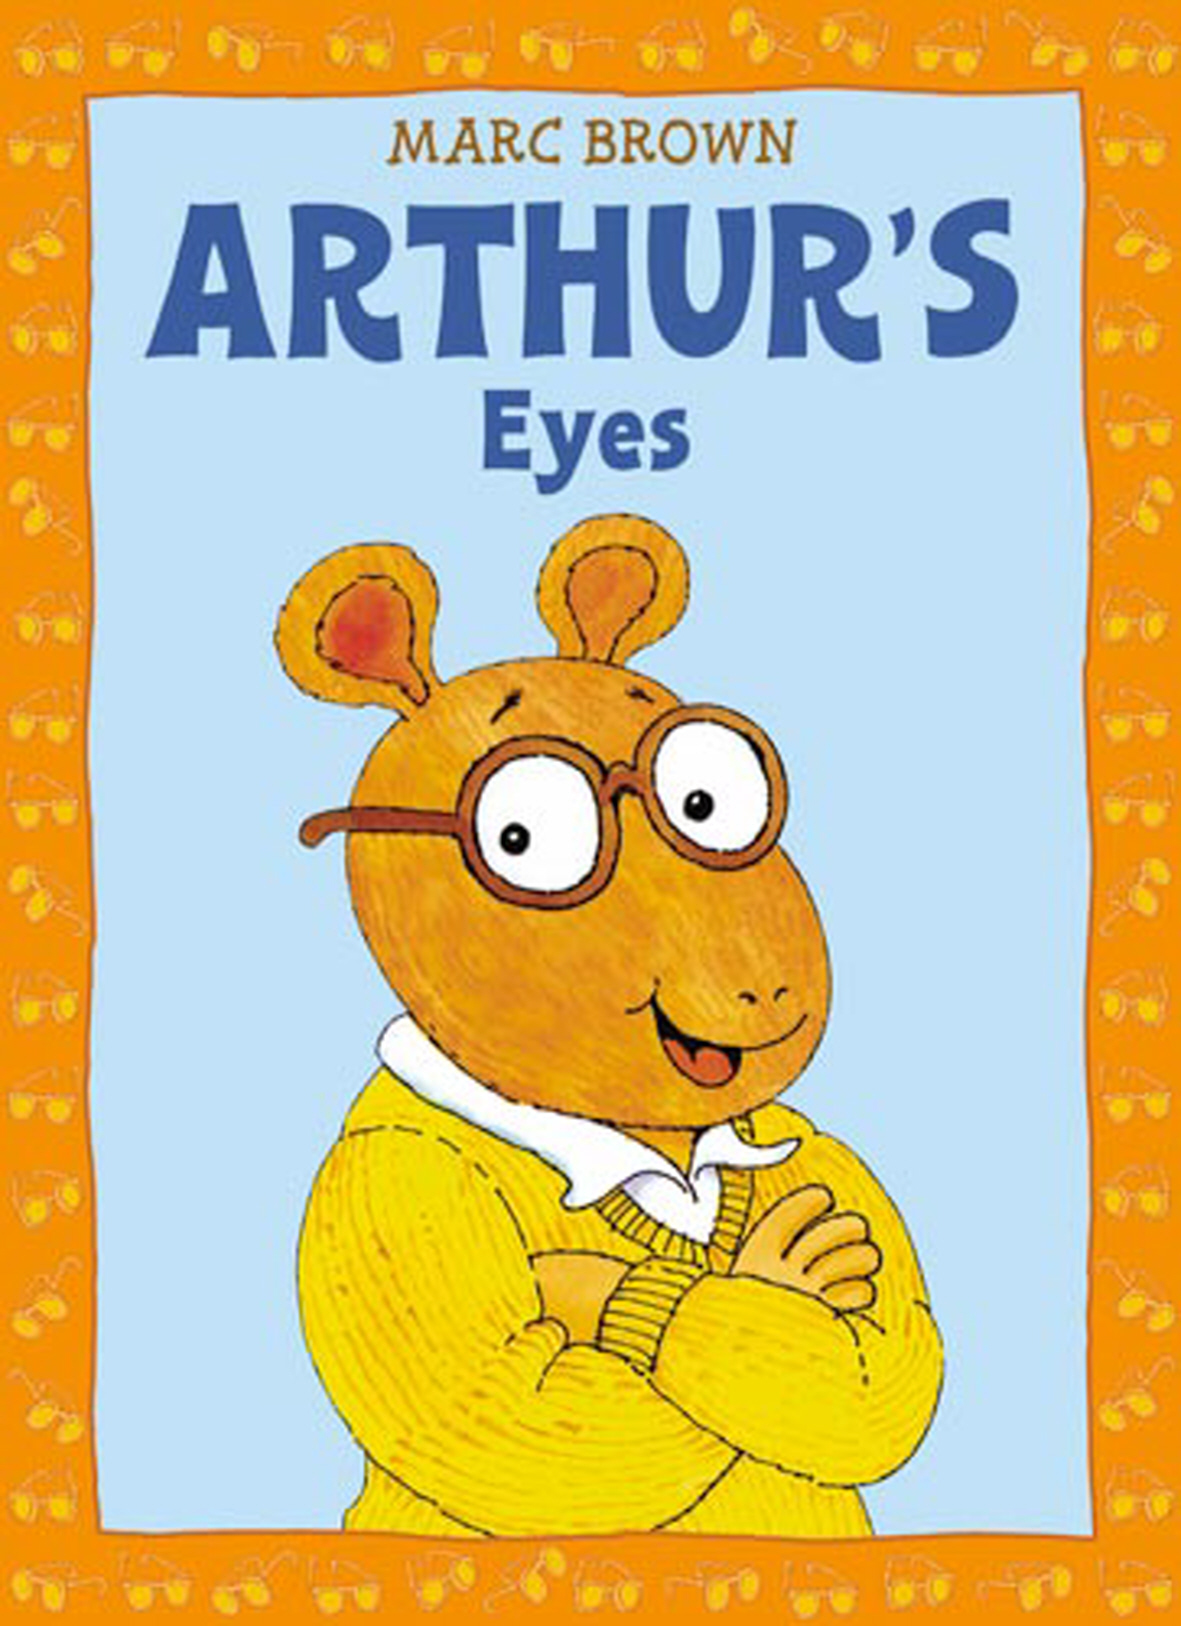 arthur's eyes: book & cd by marc brown - books - hachette australia